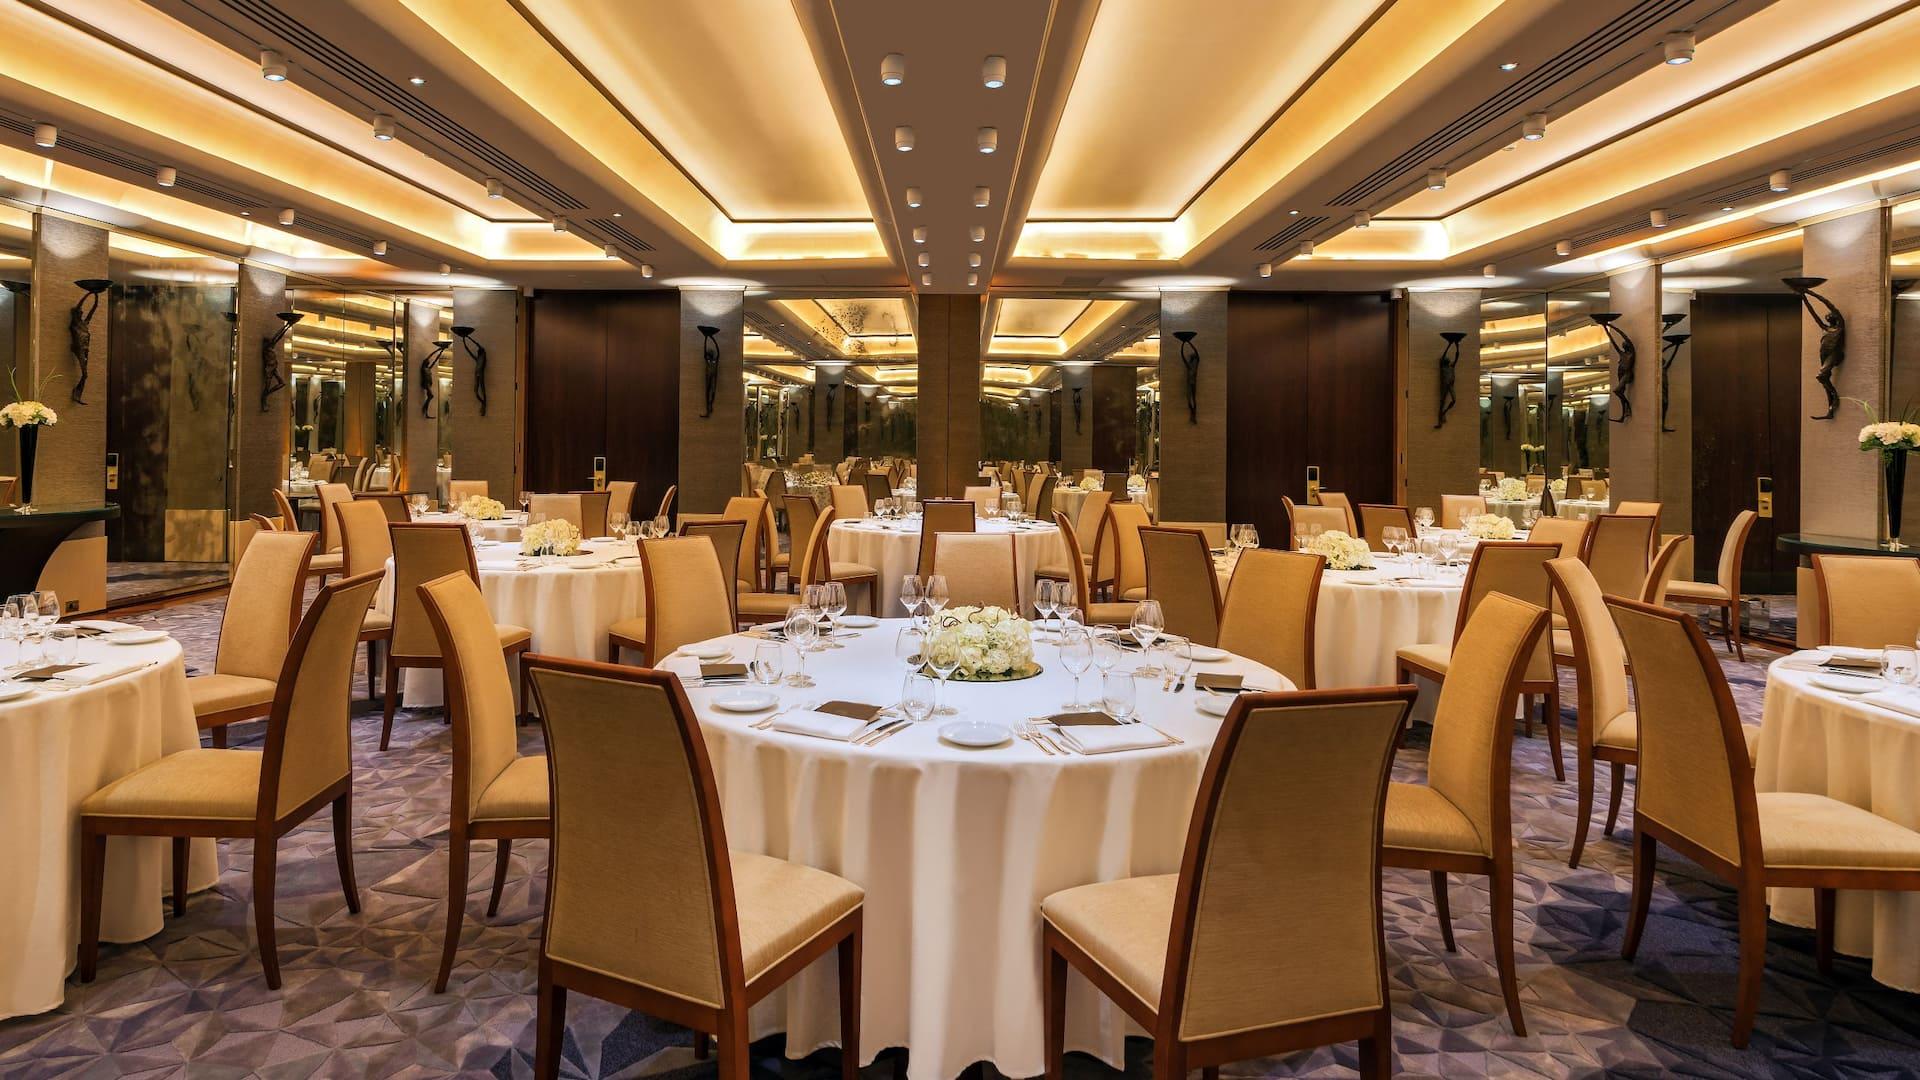 Luxury 5* Star Hotel Park Hyatt Paris-Vendôme in Central Paris